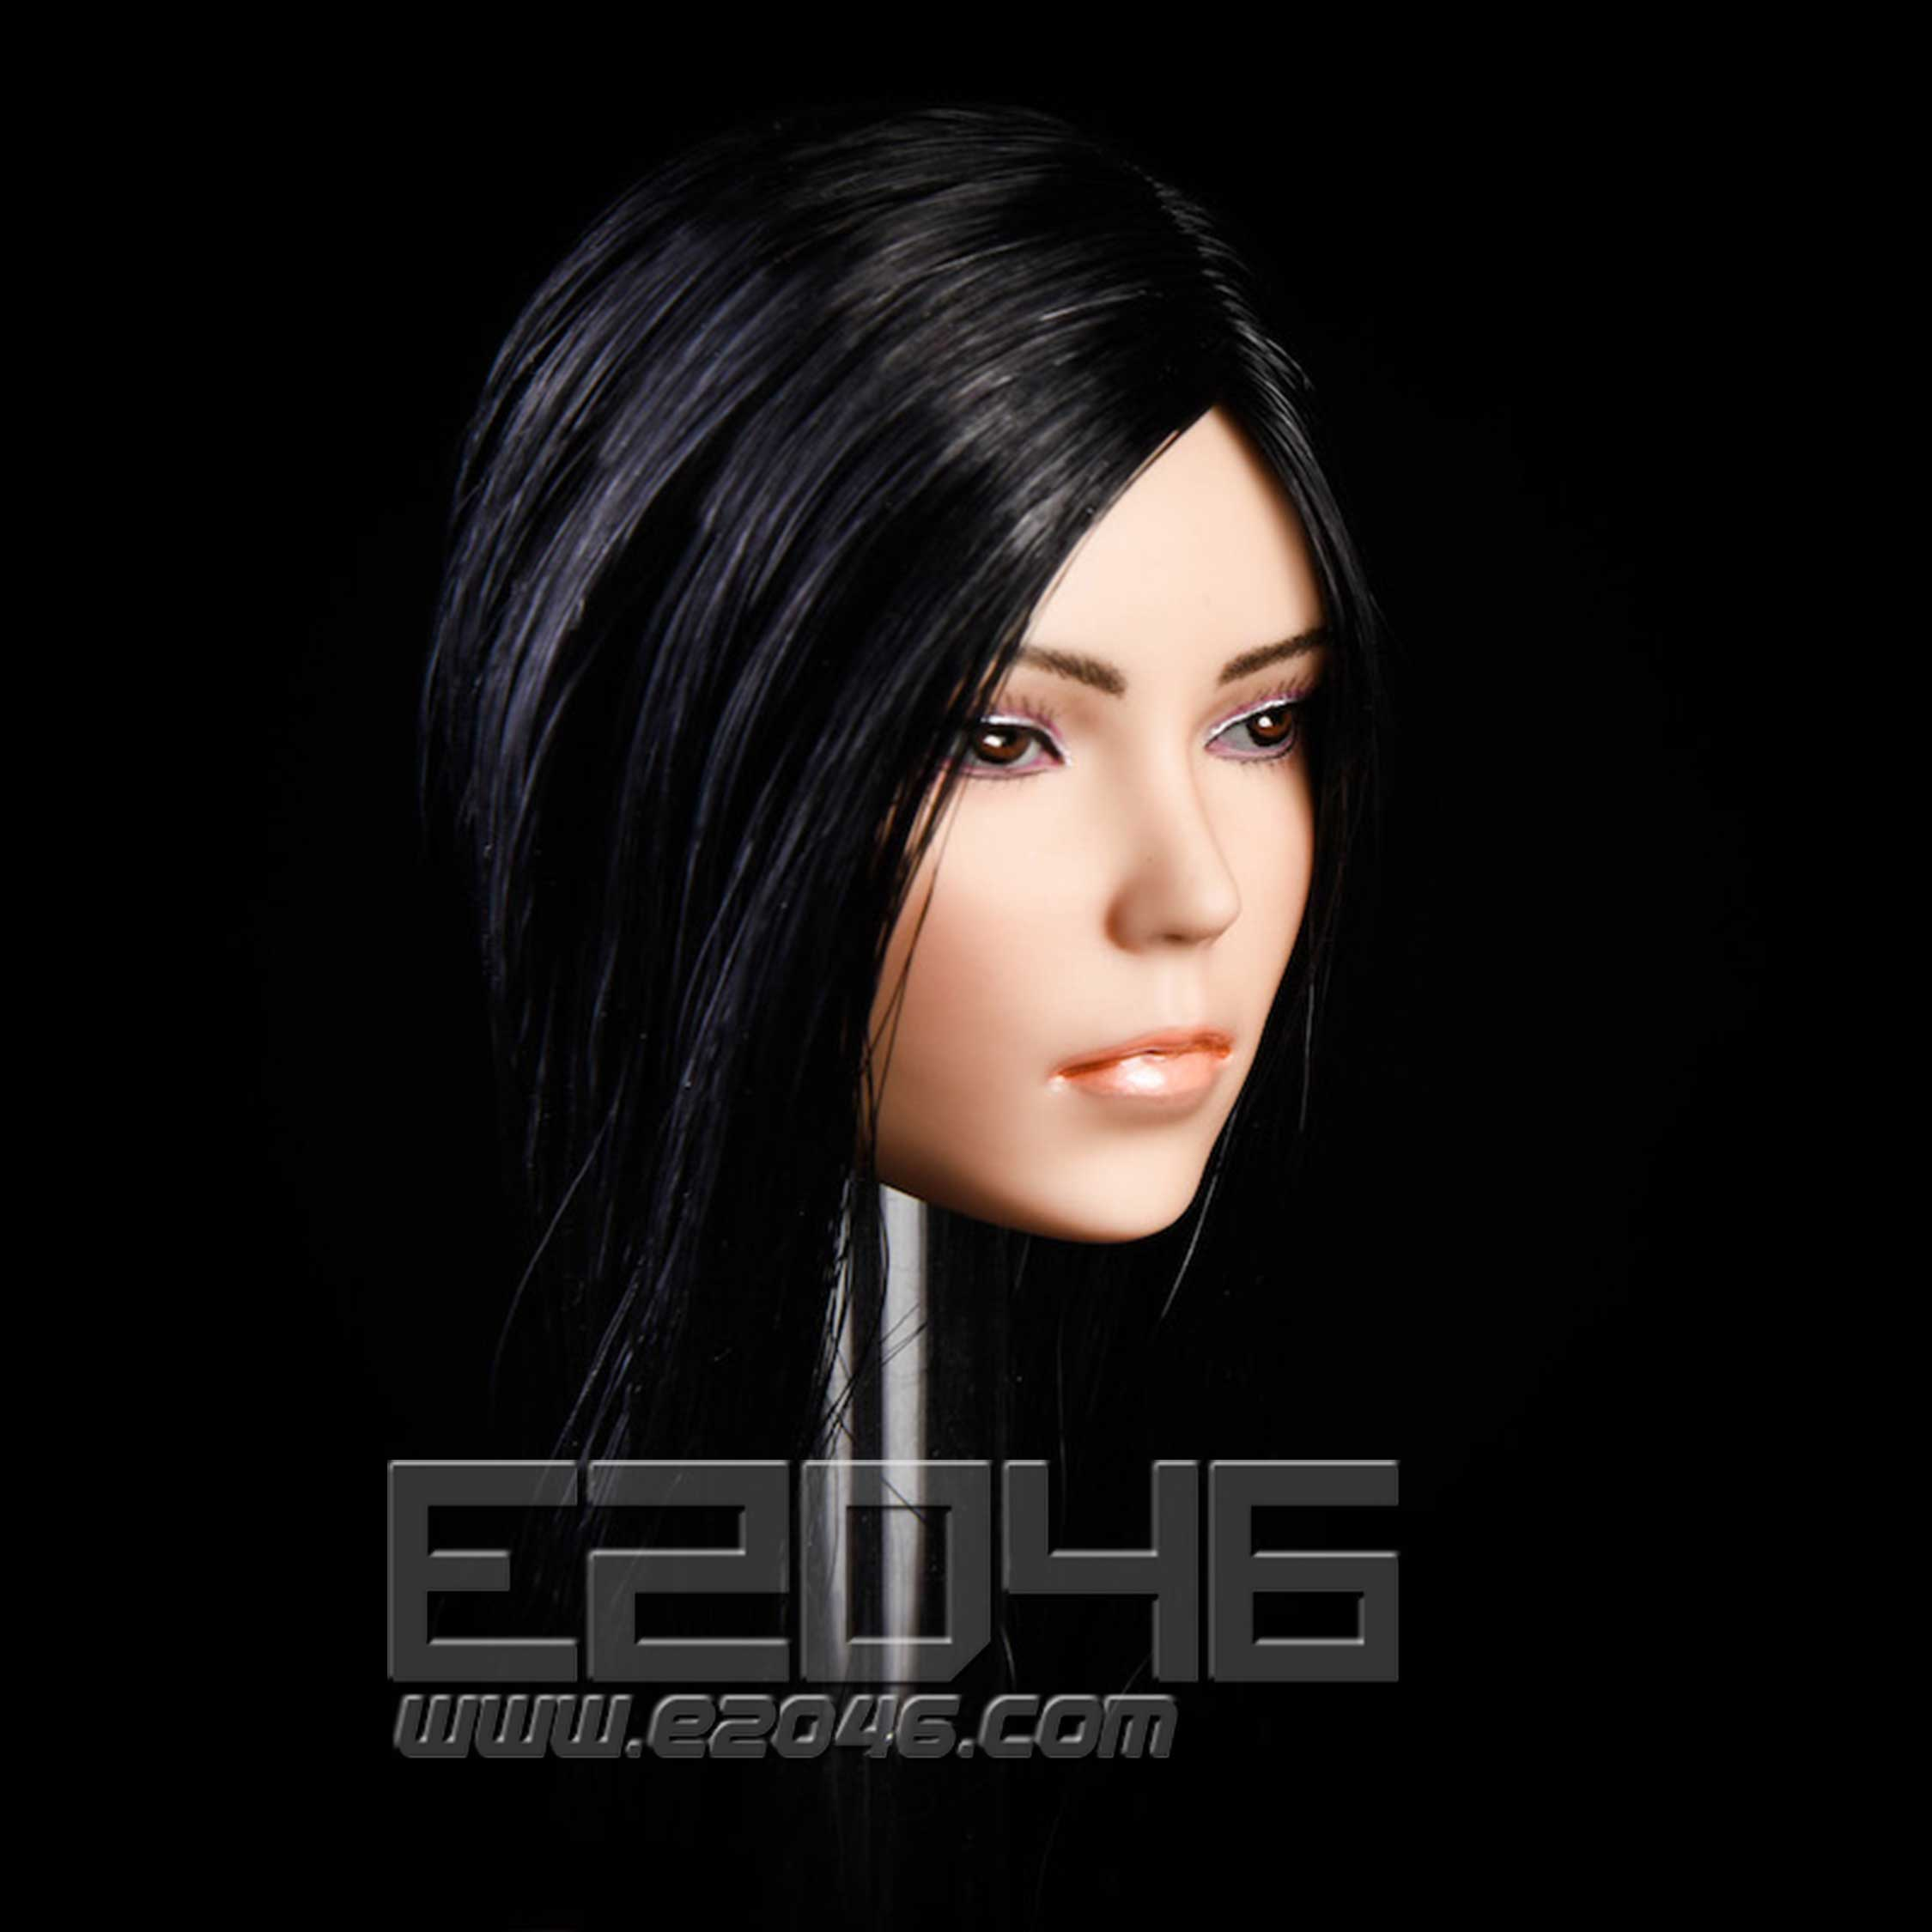 Miscegenation female head B (DOLL)